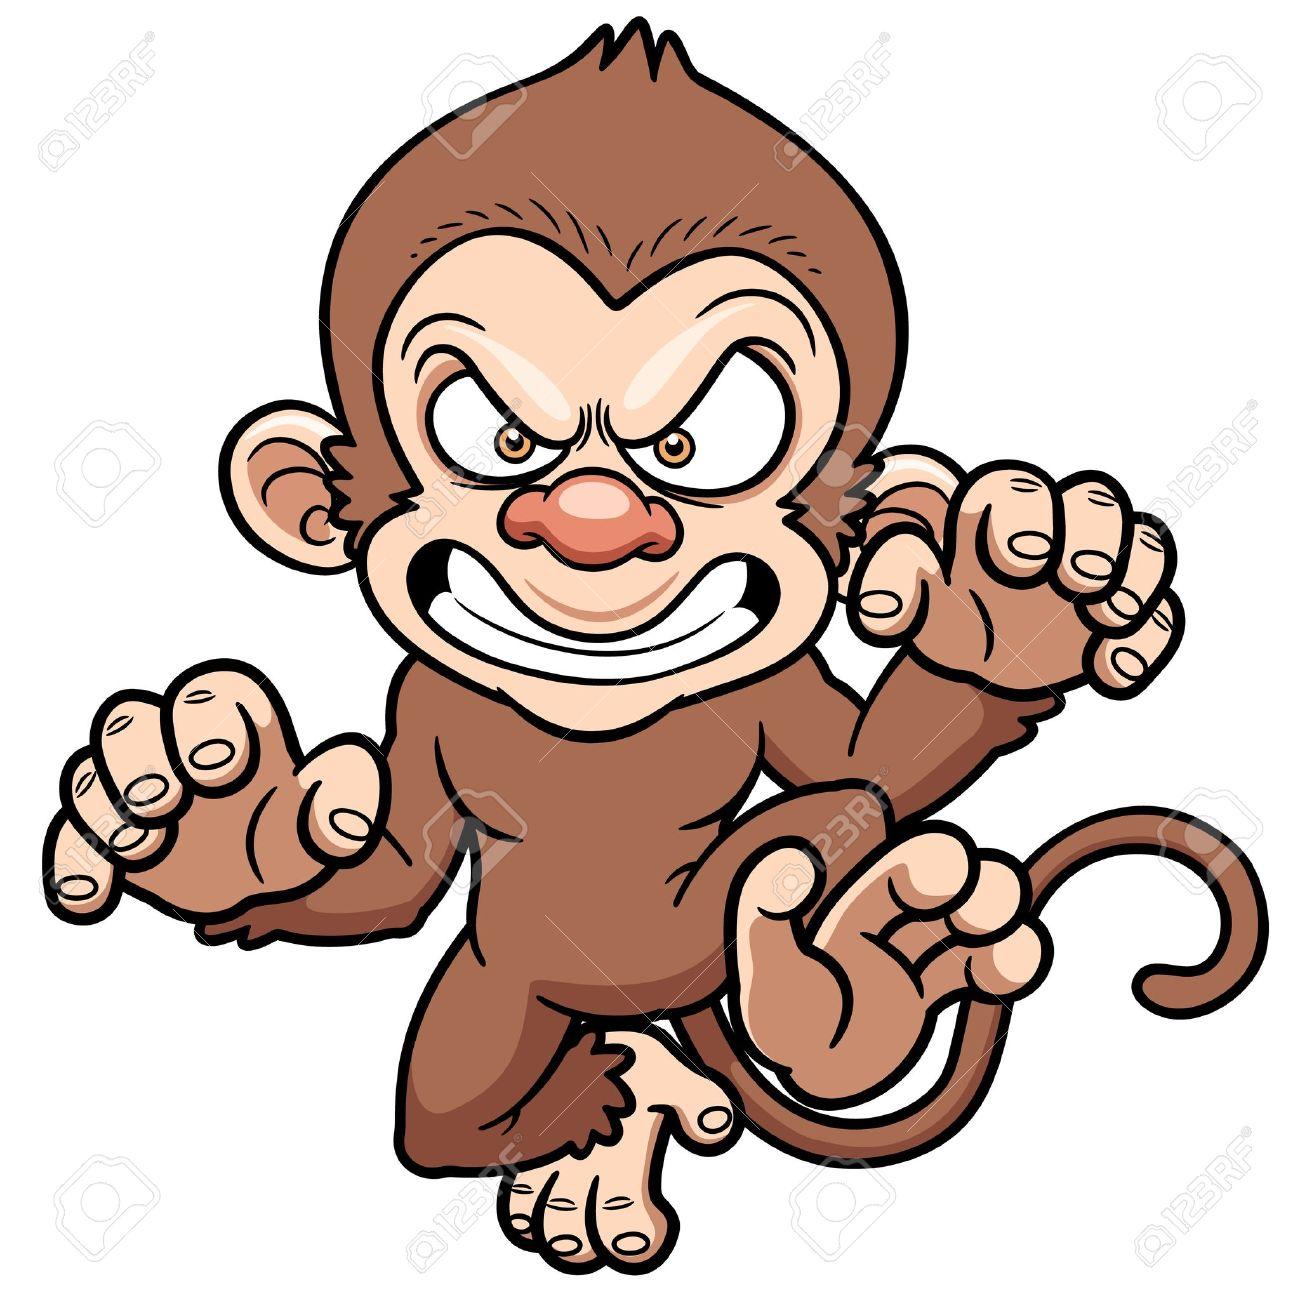 Illustration Of Cartoon Angry Monkey Stock Vector   21453120